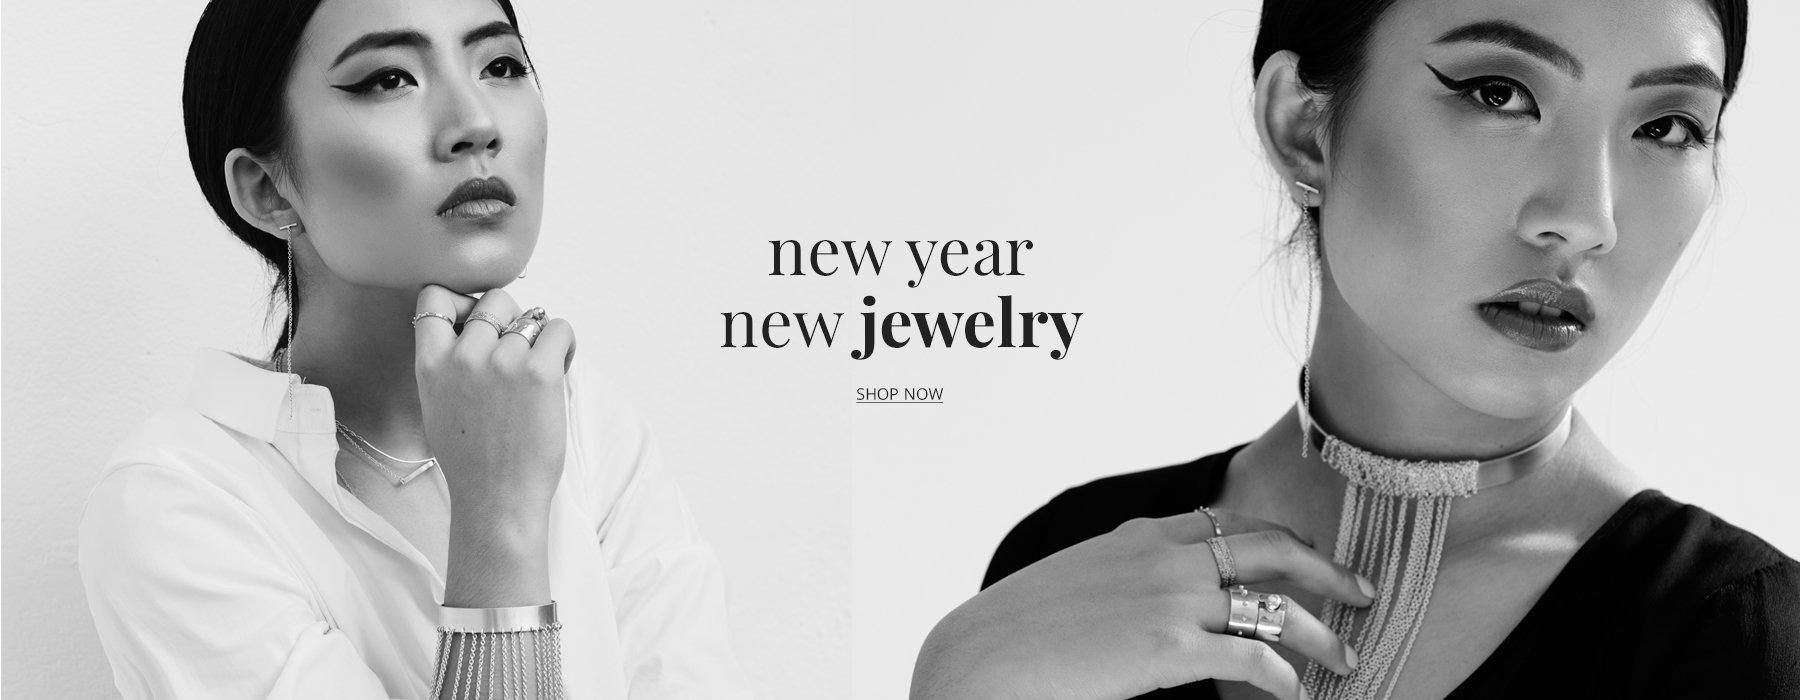 New Year, New Jewelry